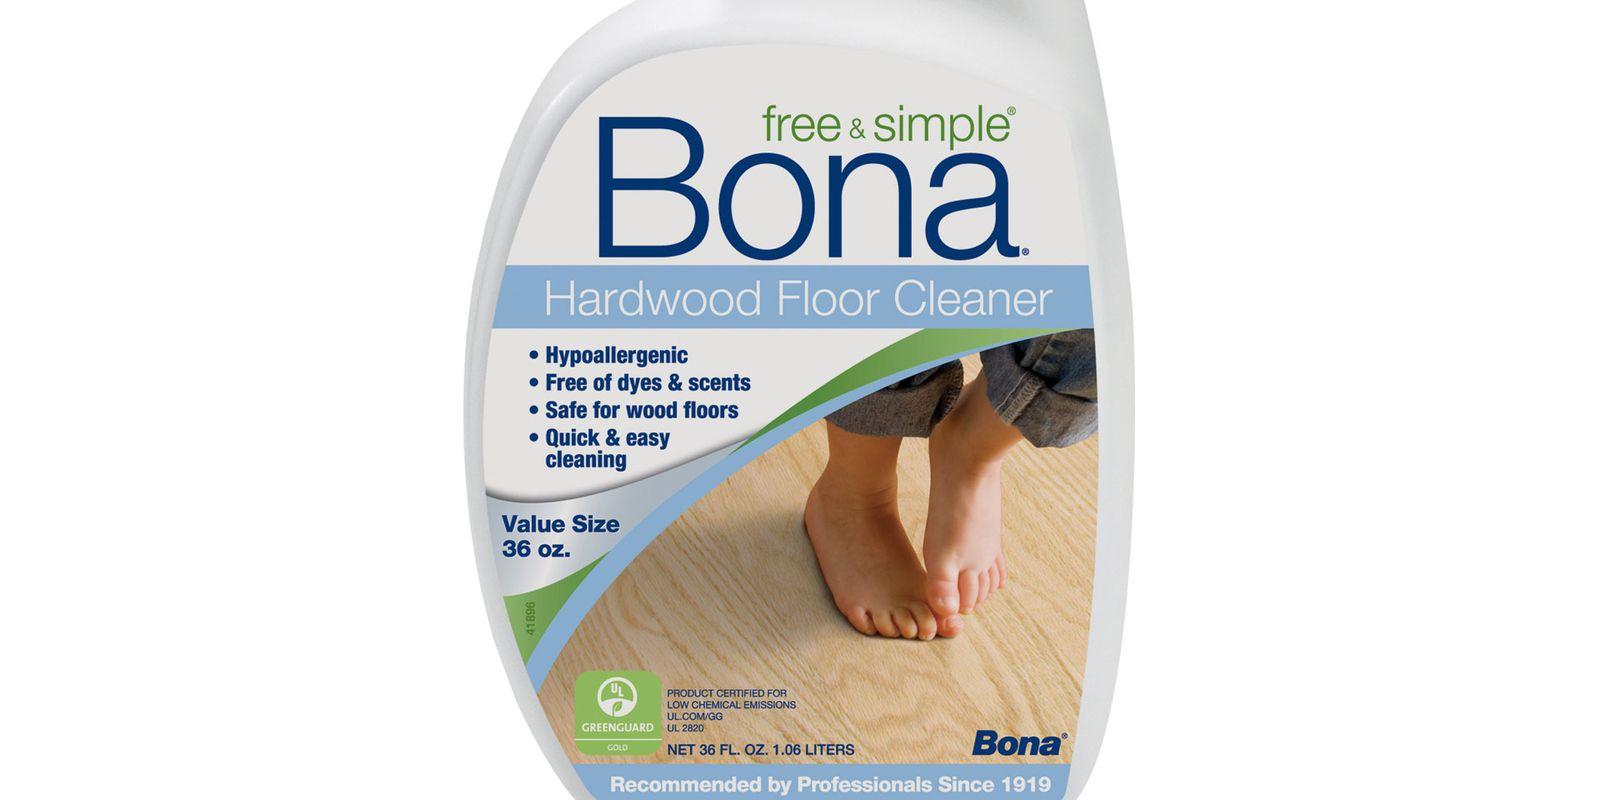 bona free simple hardwood floor cleaner review